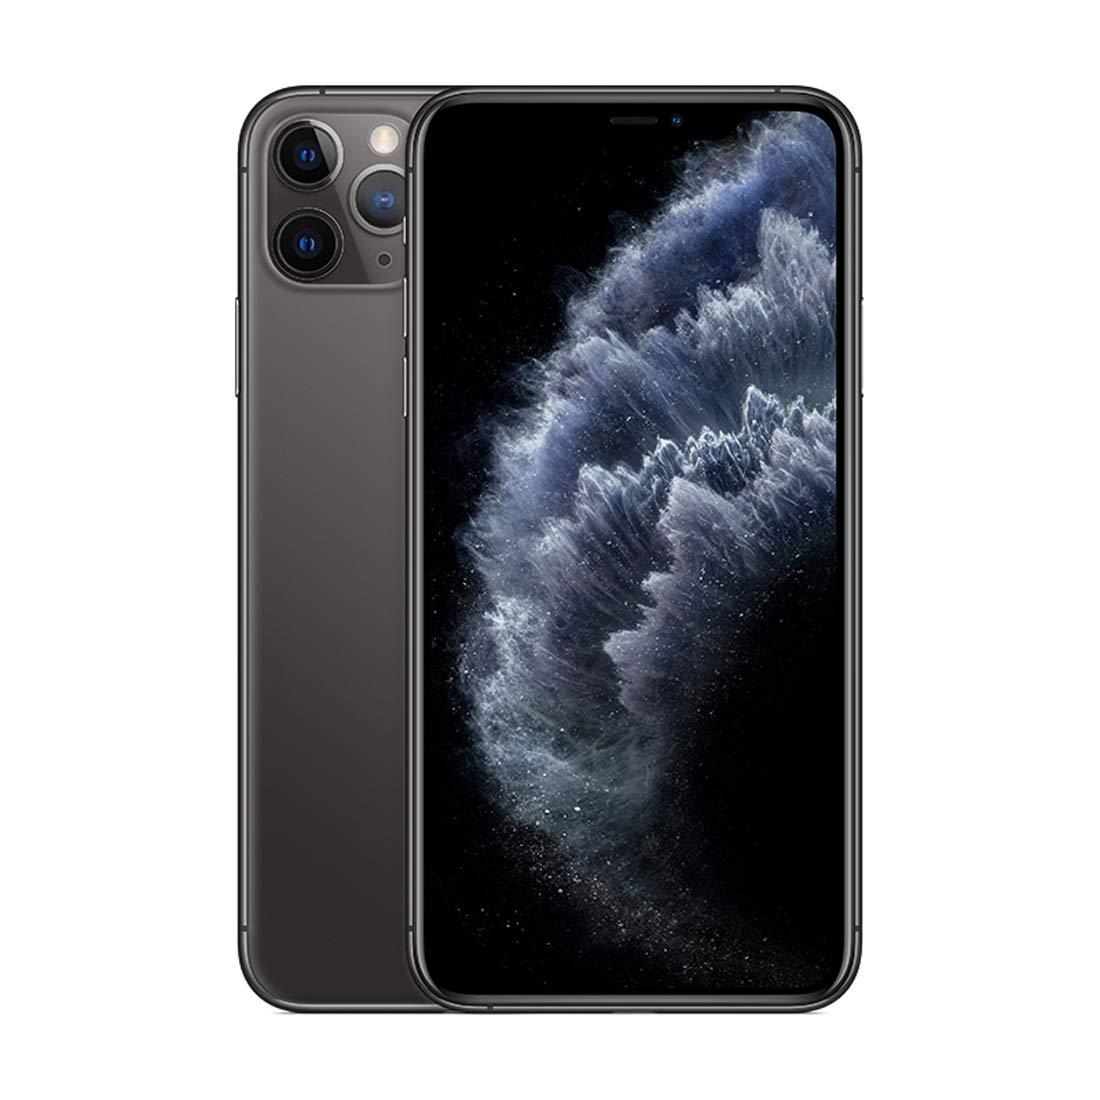 Generic Goophone 11max 512GB Cell Phone - International Version (Black)